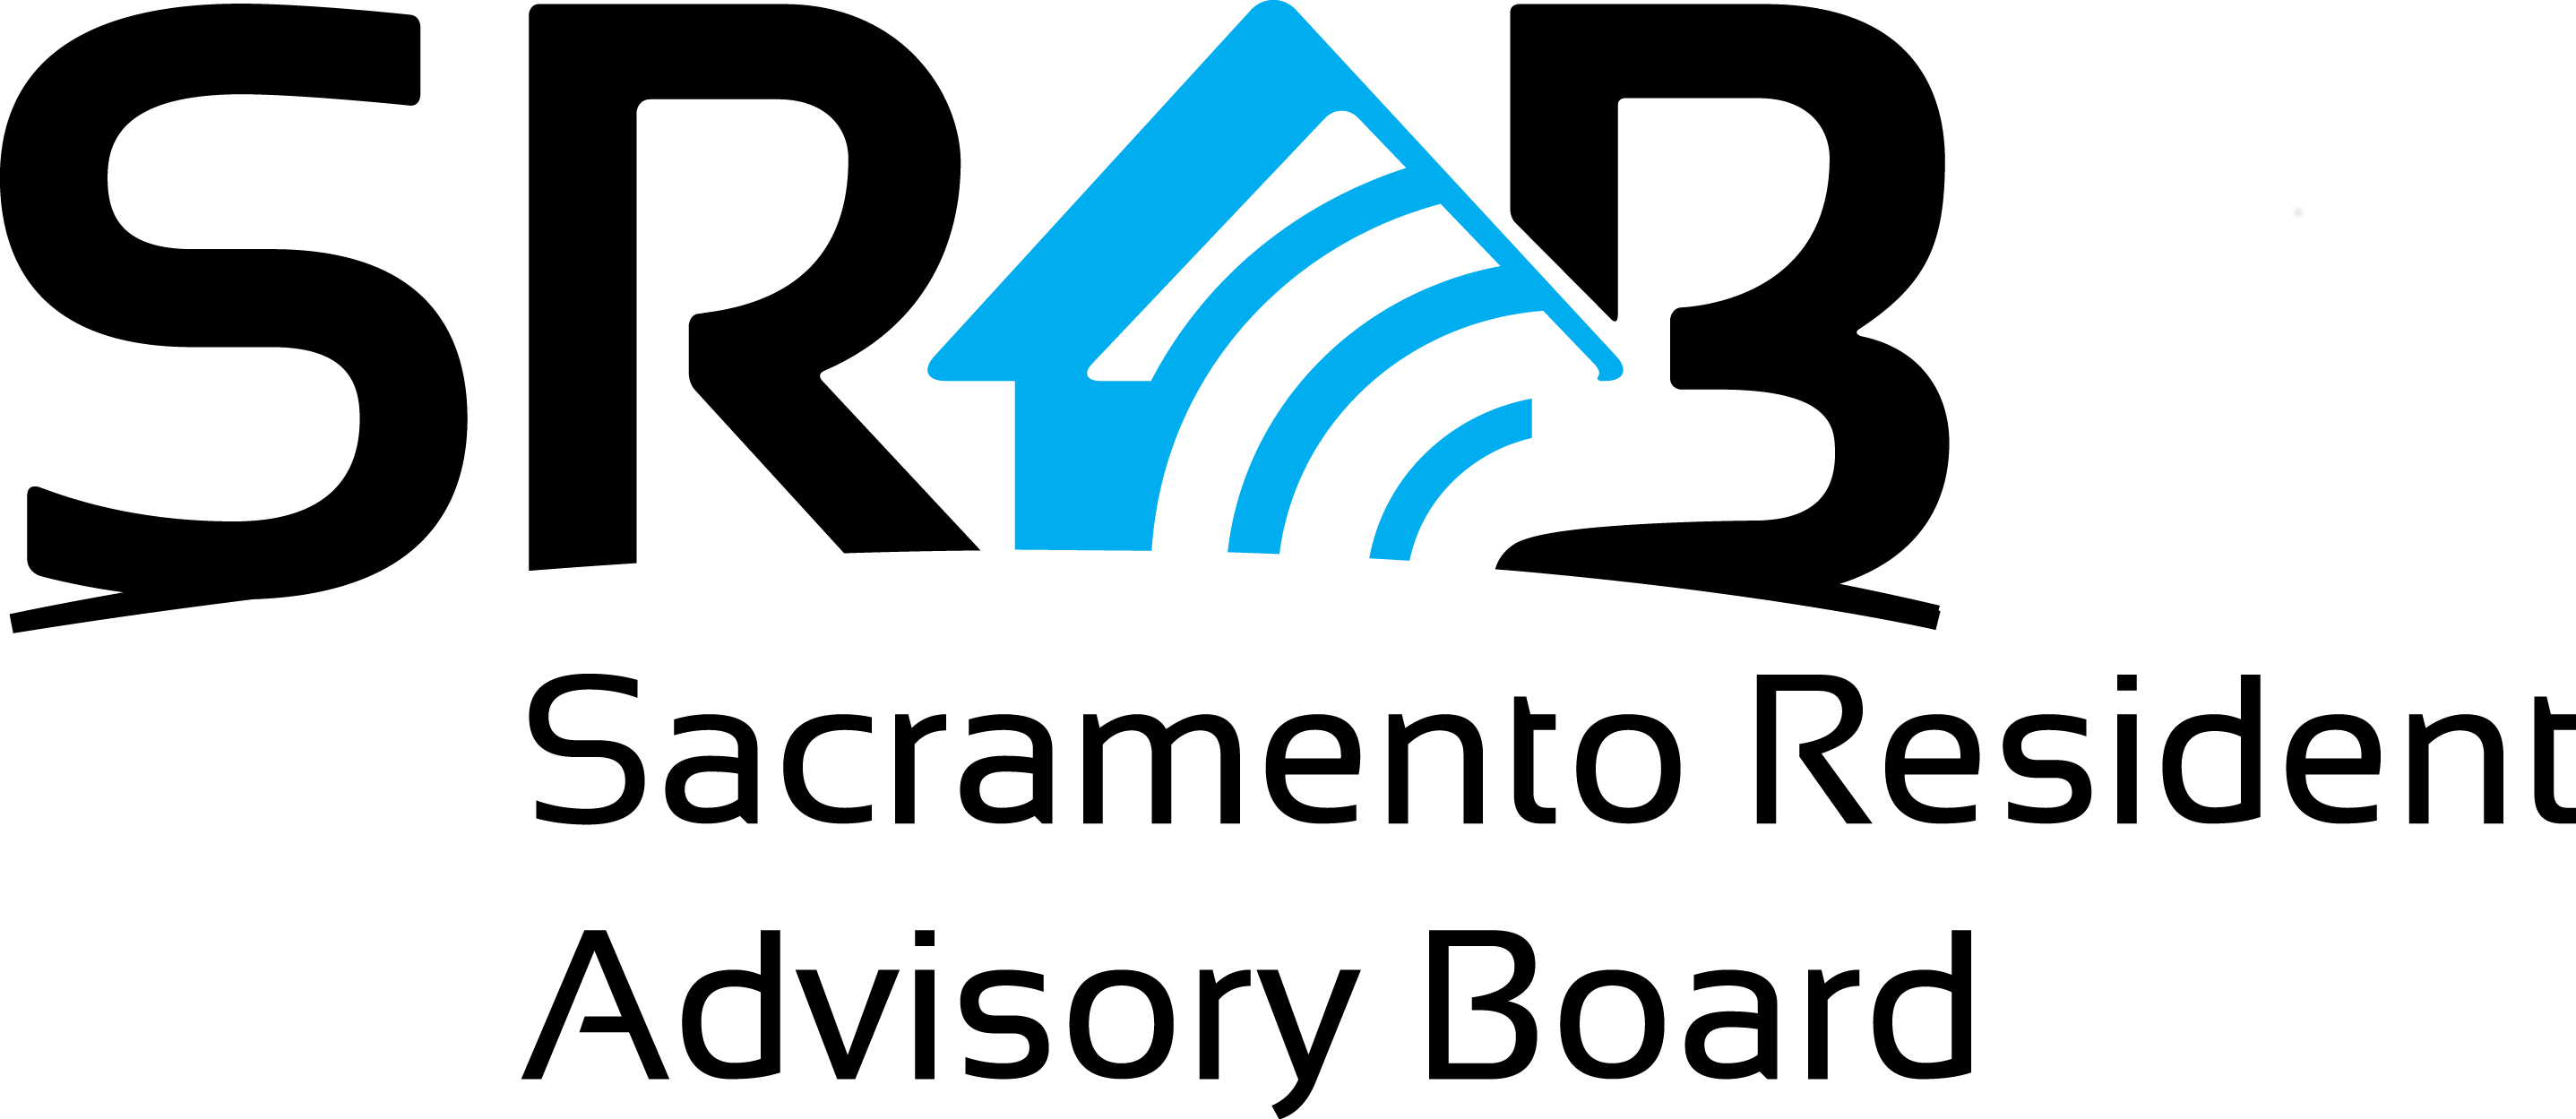 Sacramento Resident Advisory Board logo